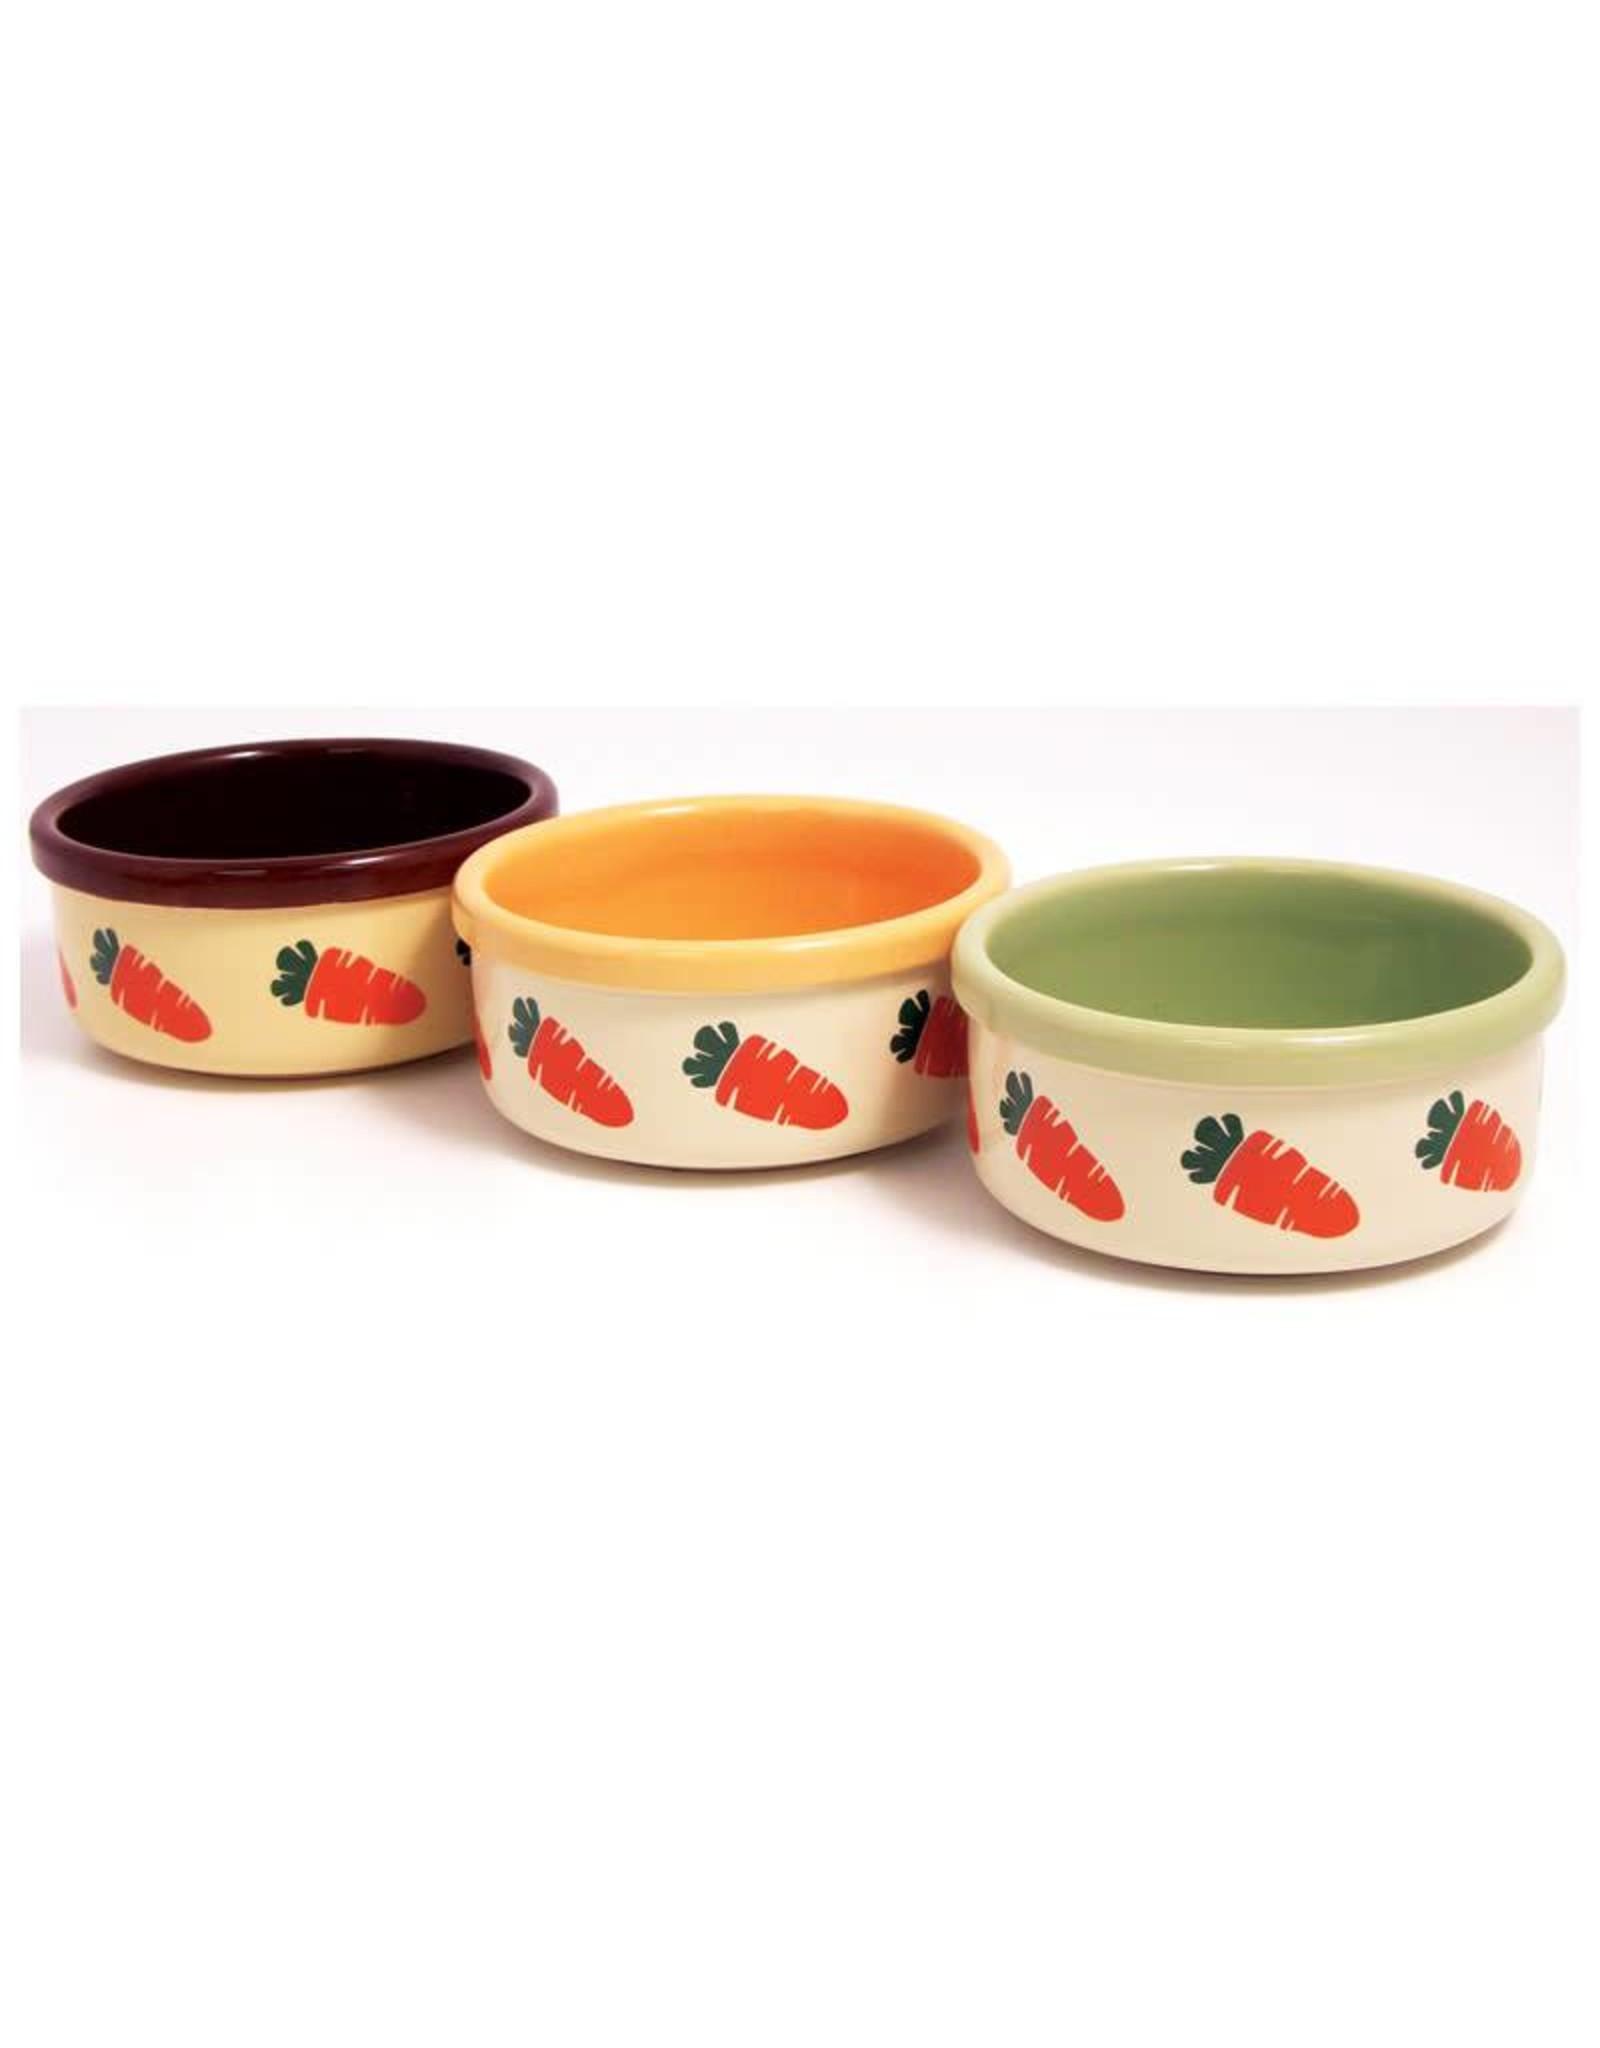 Rosewood Ceramic Carrot Design Small Animal Bowl, 13cm 5inch